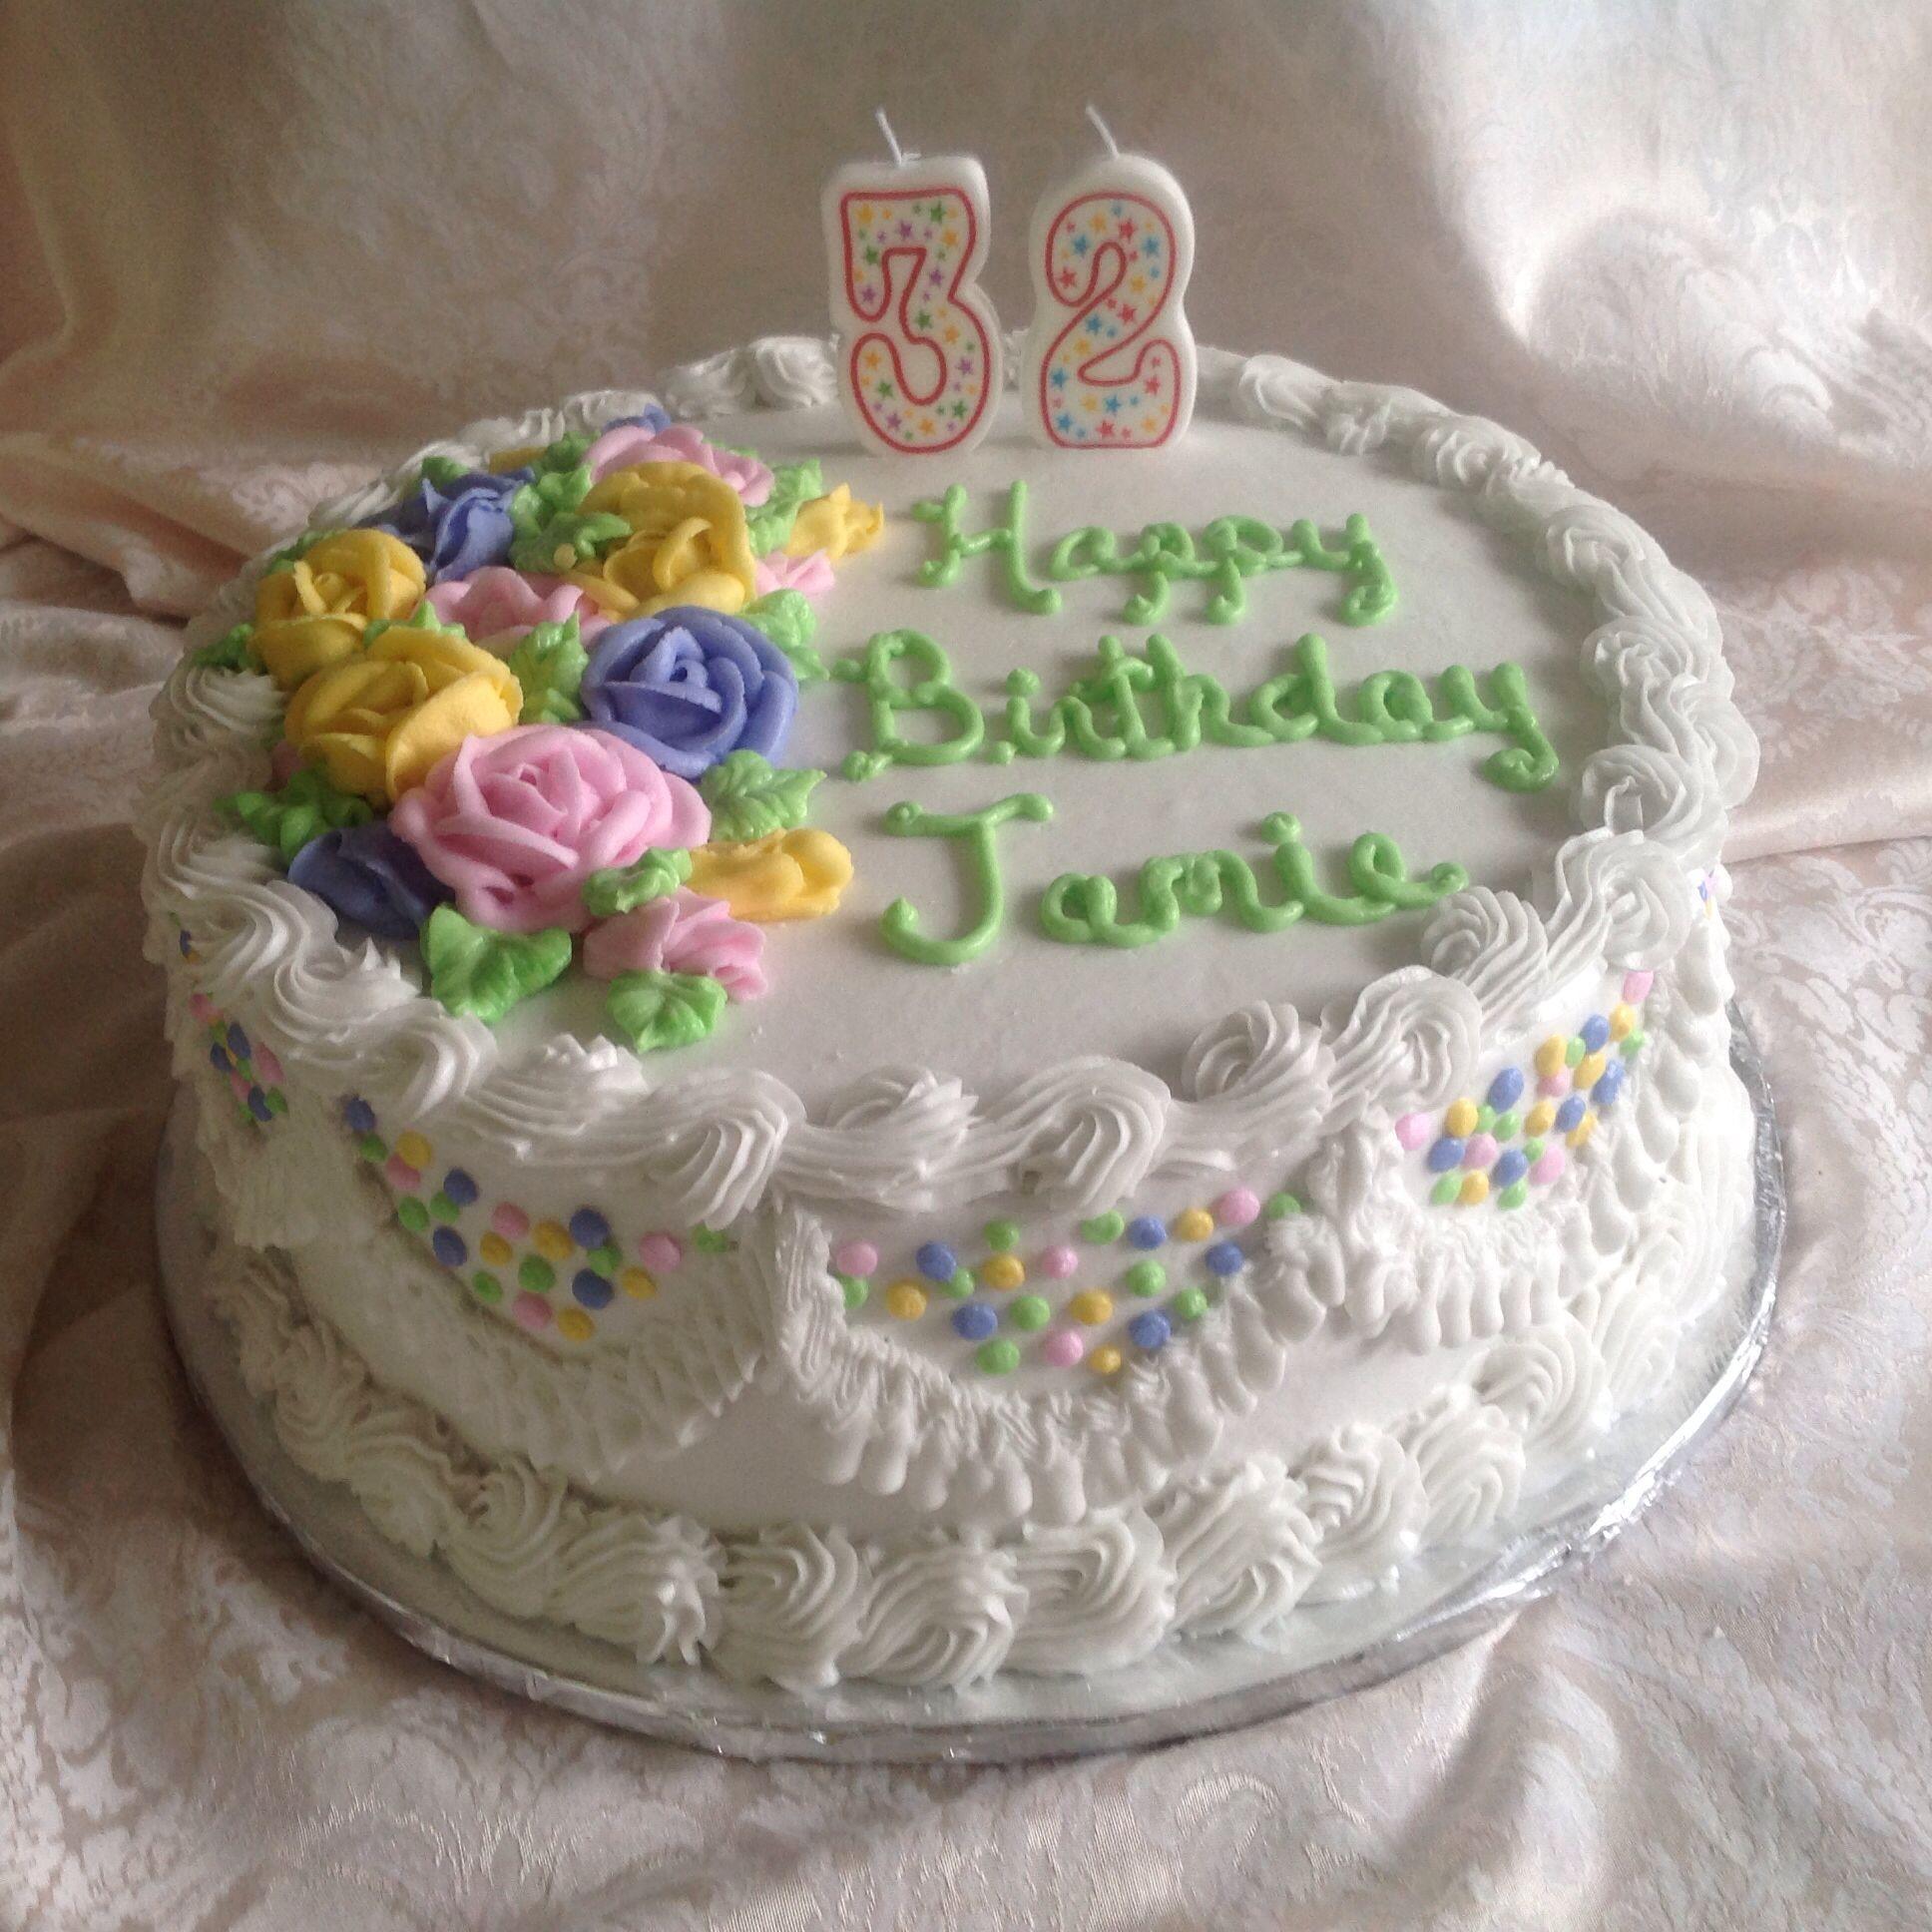 Jamies 32 Birthday Cake A Few Of The Goodies I Make Pinterest